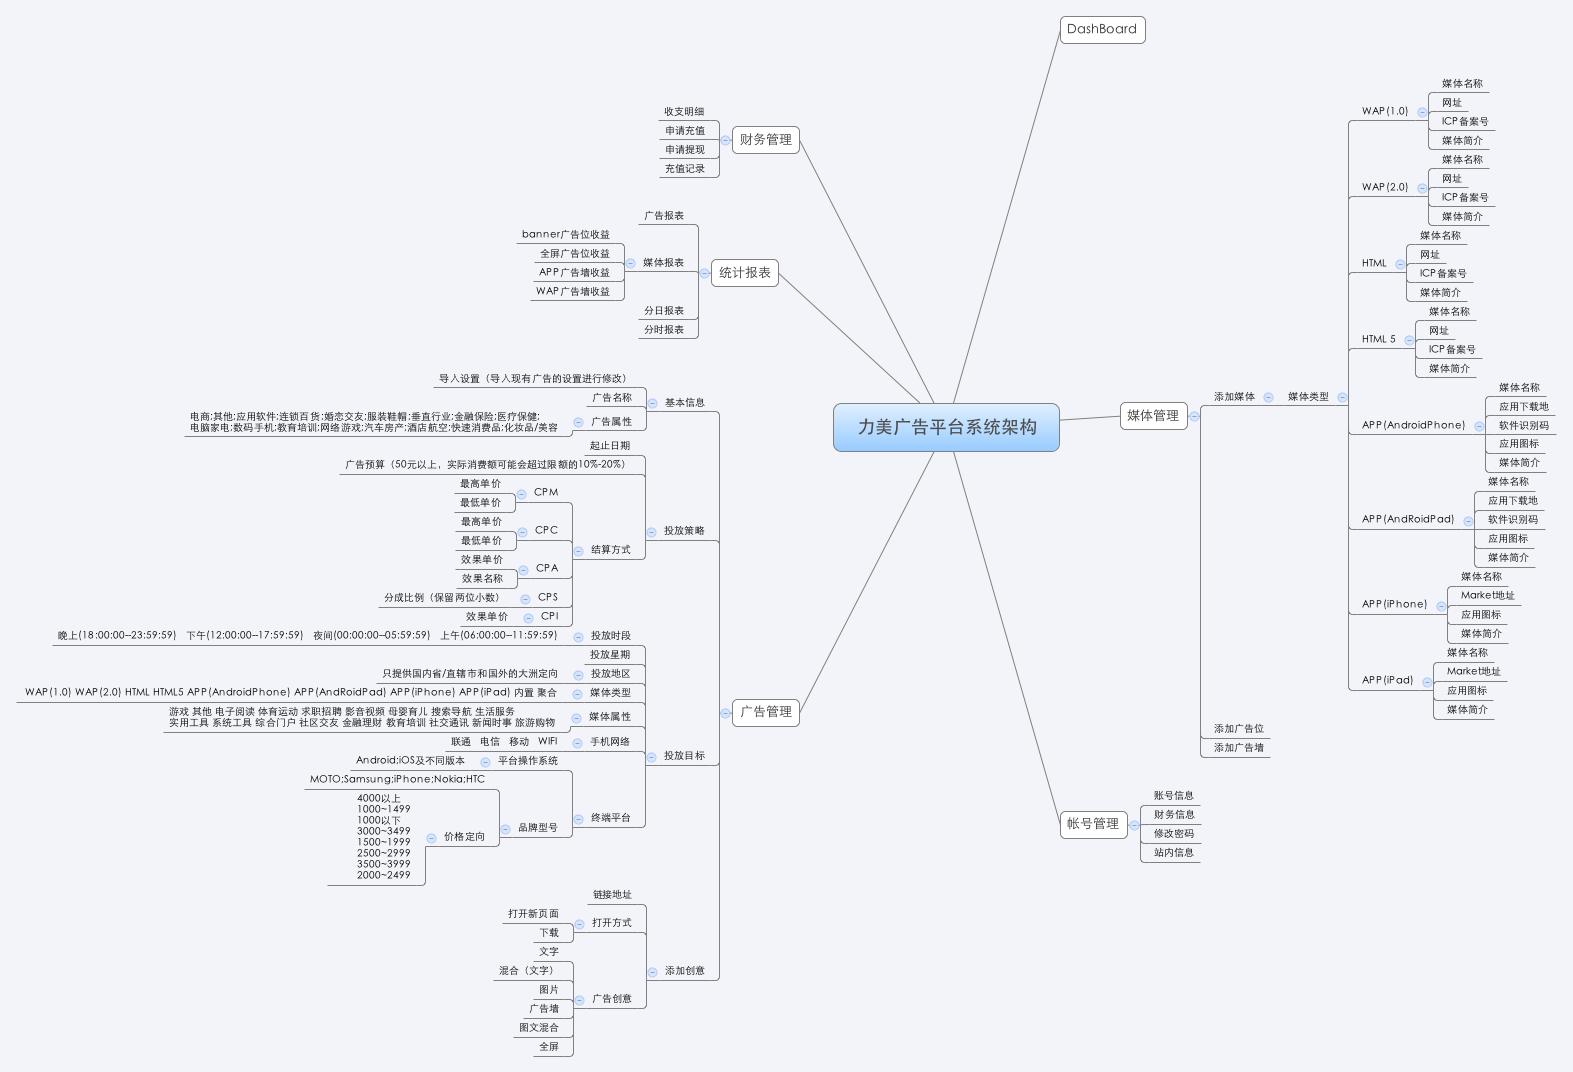 IMmob的系统结构